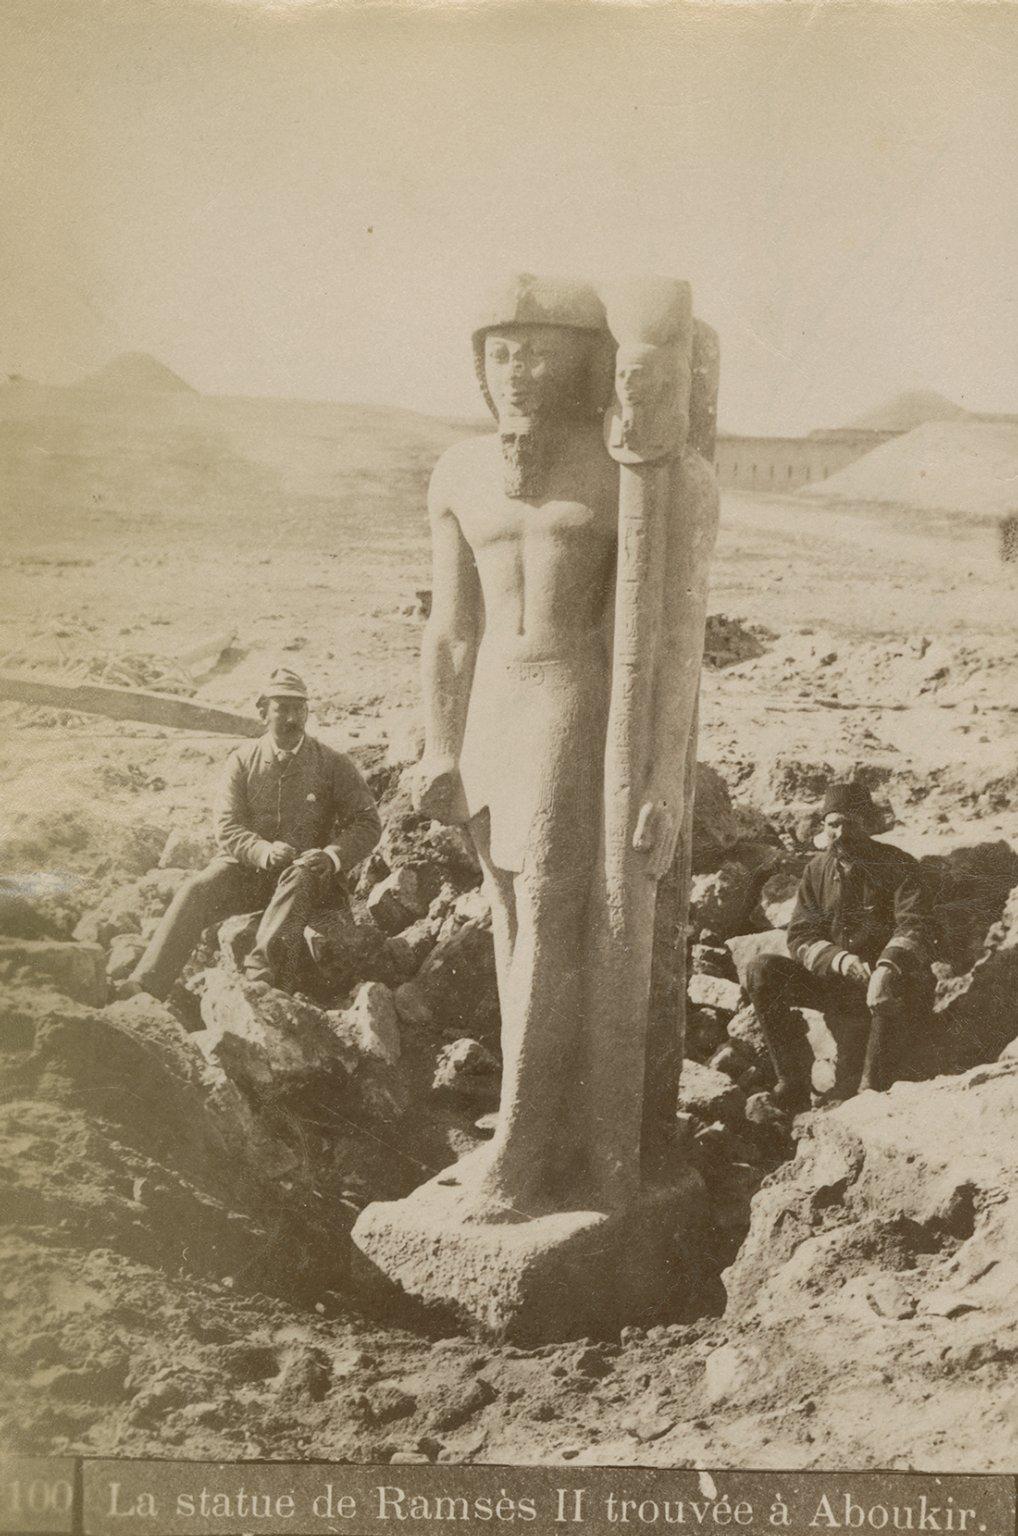 Statue of Rameses II, Abu Qir